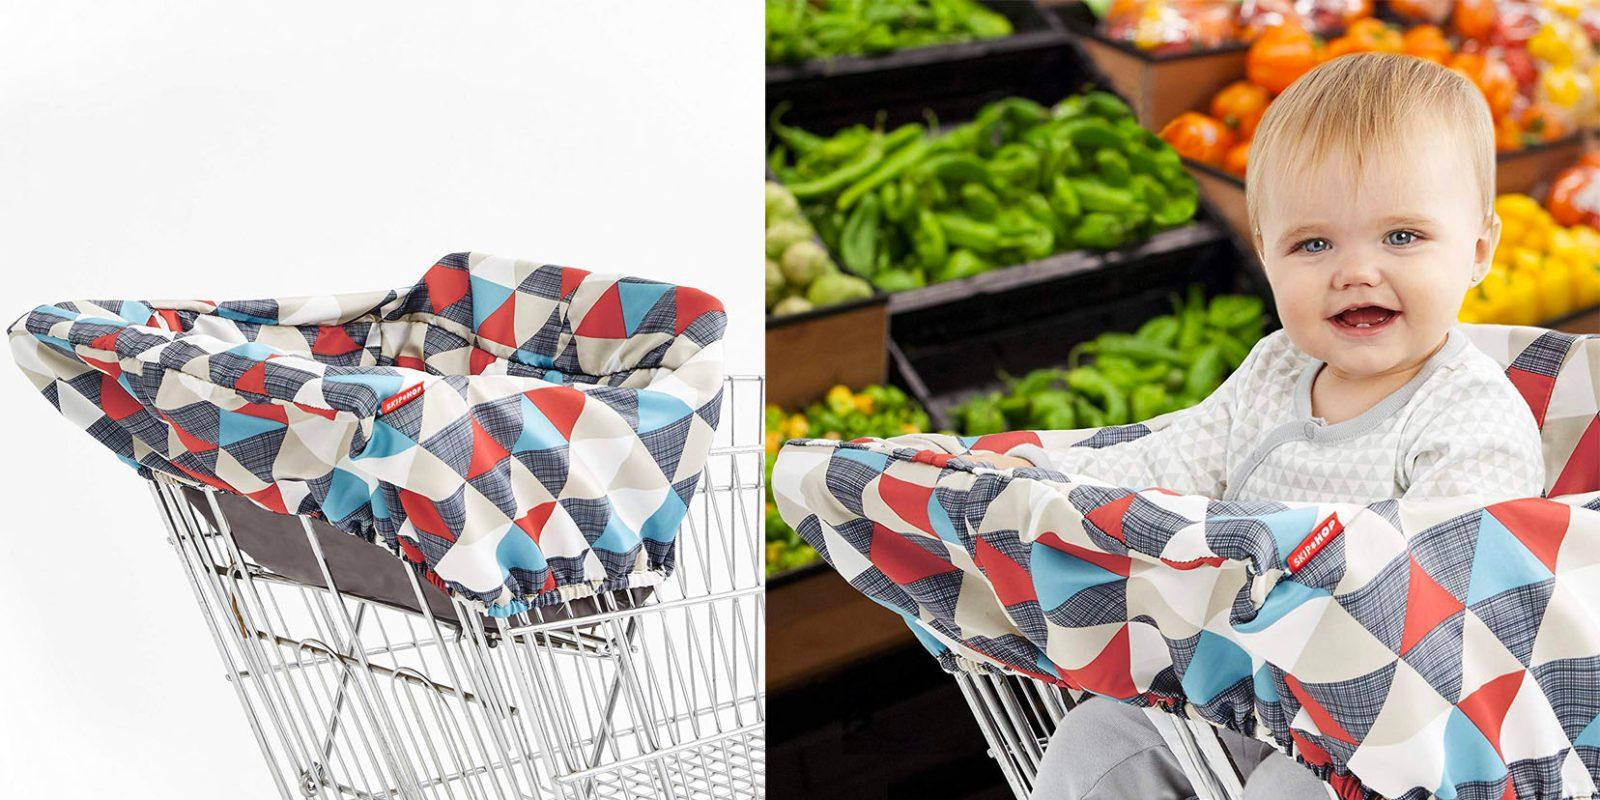 Flipboard Skip Hops Shopping Cart High Chair Cover Is